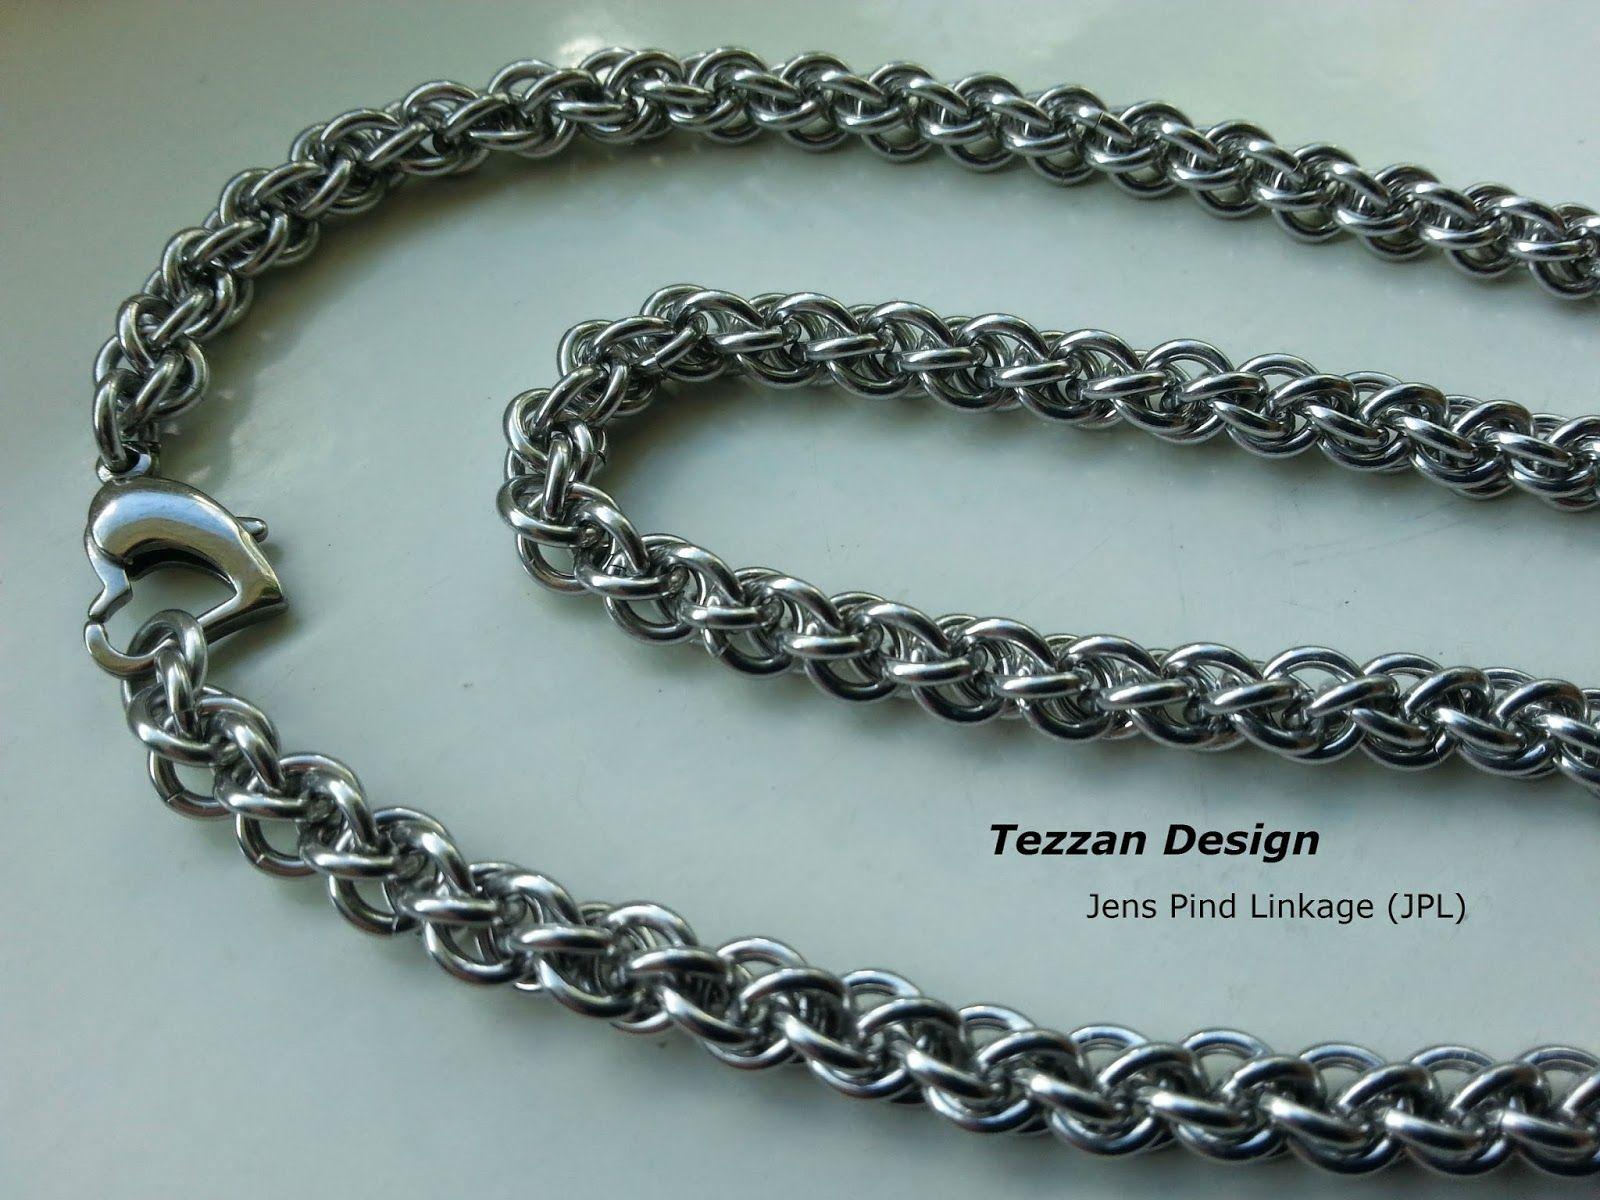 Tezzan design jens pind linkage jpl necklace beadsjewelry